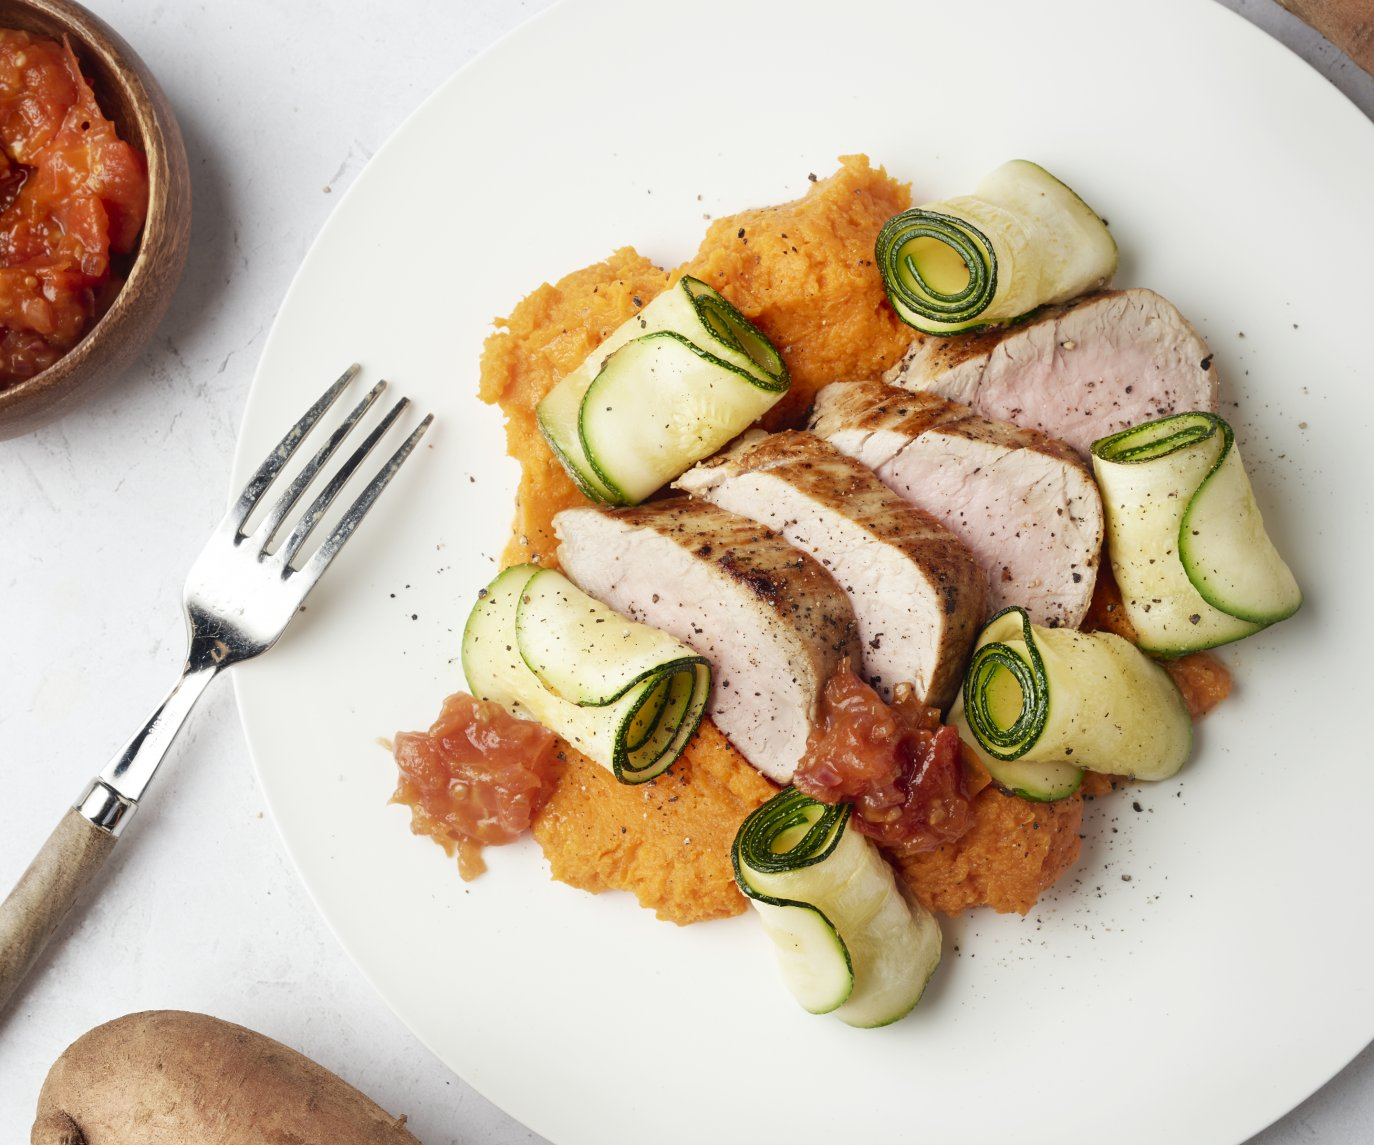 Varkenshaasje met zoete aardappelpuree, tomatenchutney en courgetterolletjes